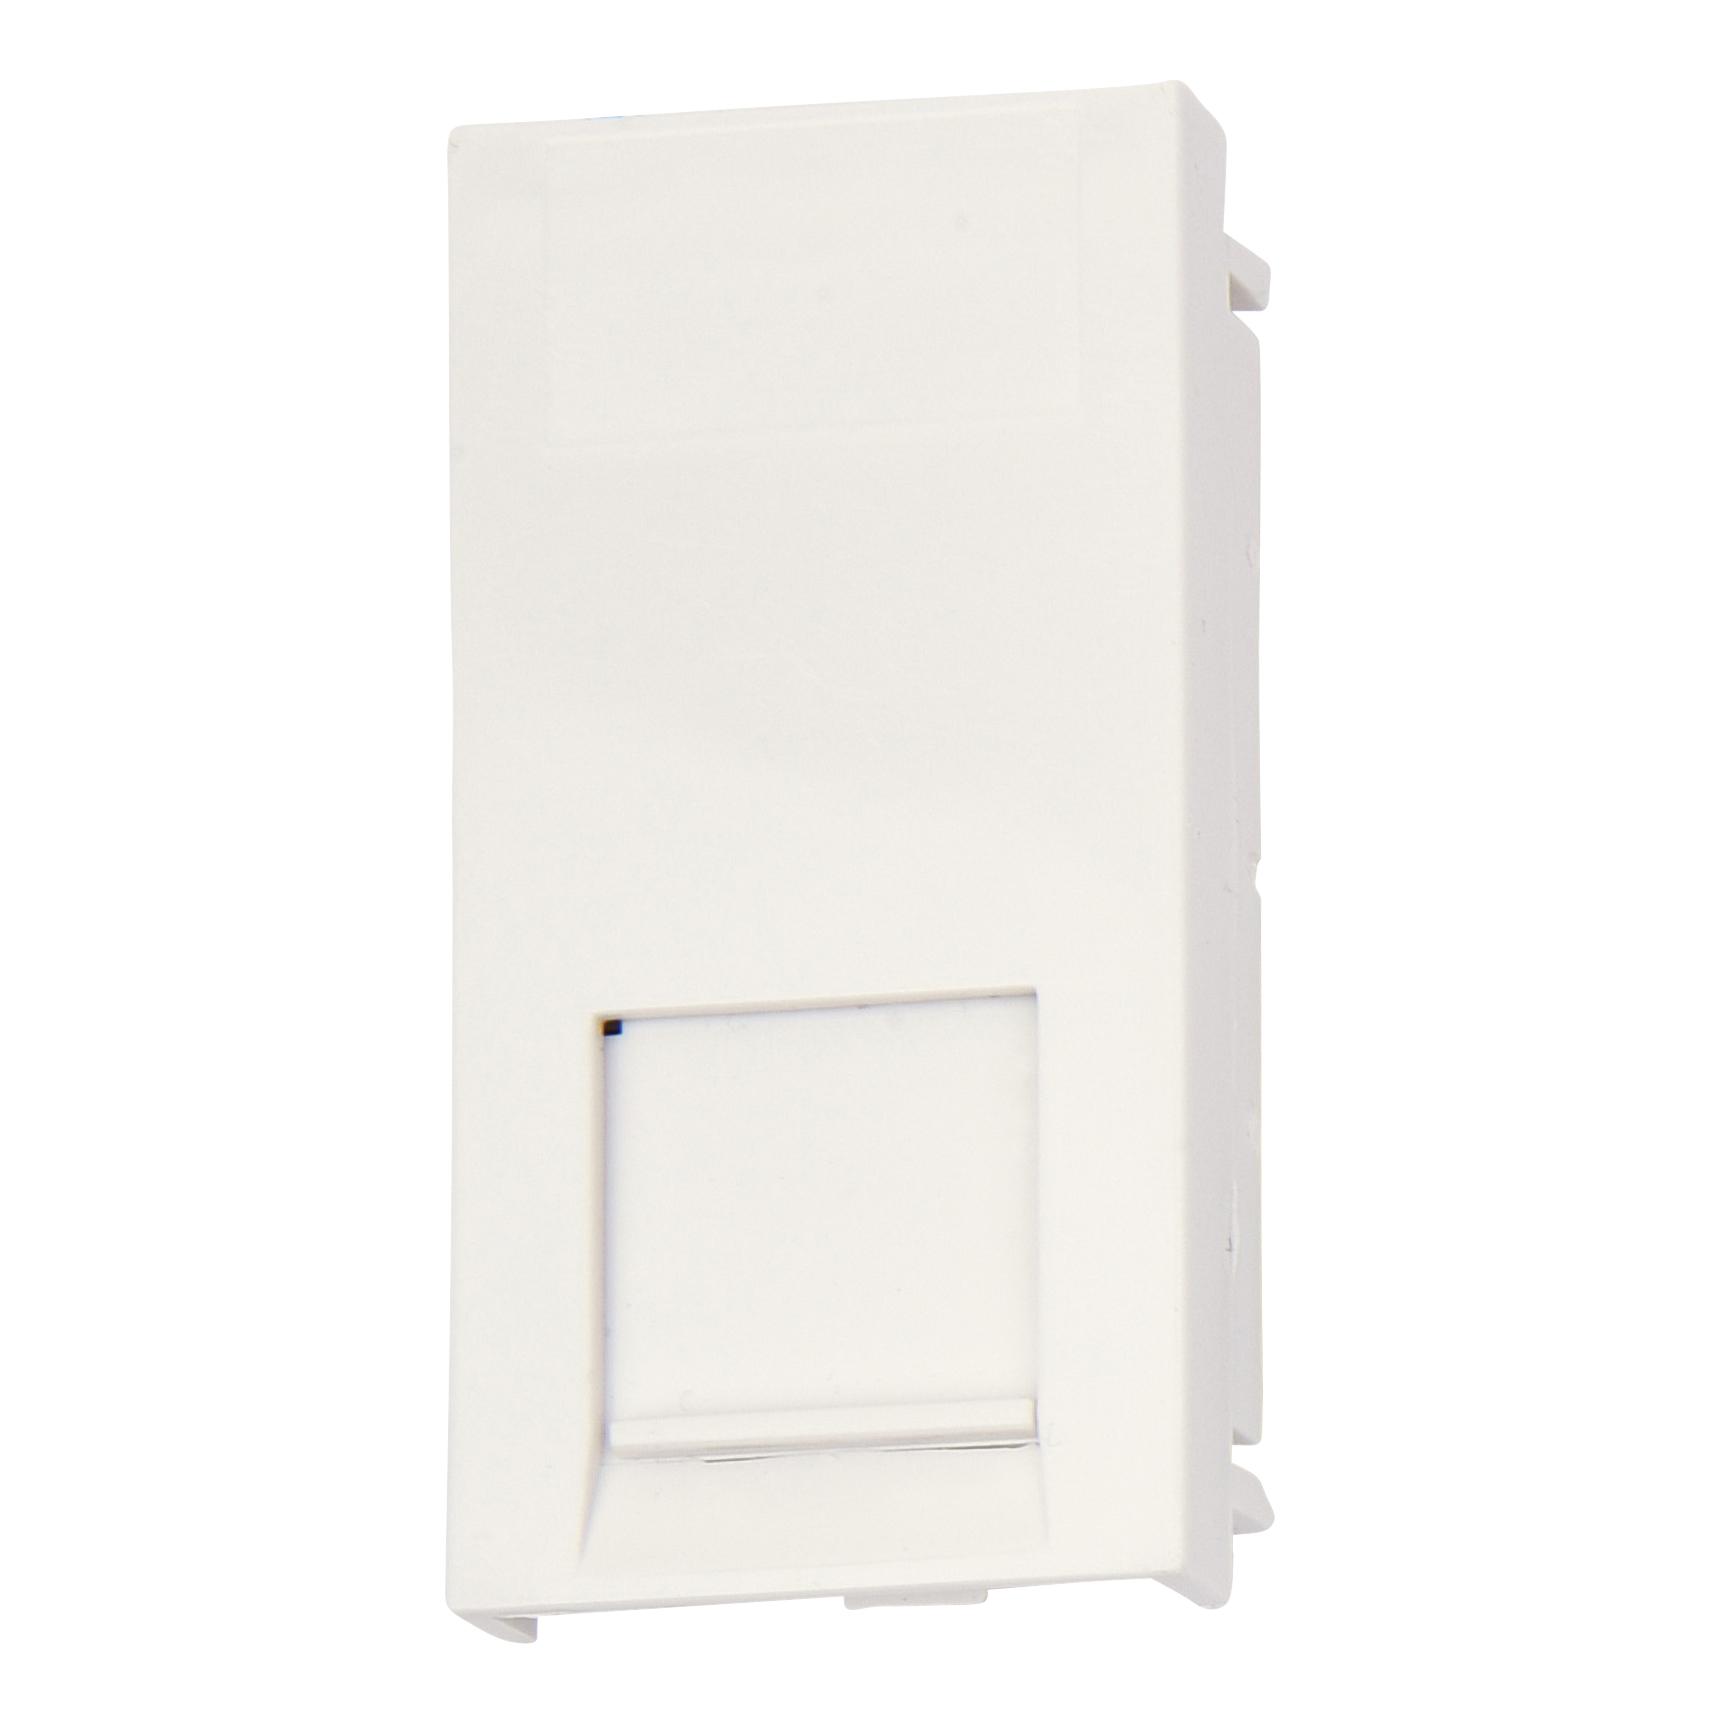 Deta RJ45 Data Module - White